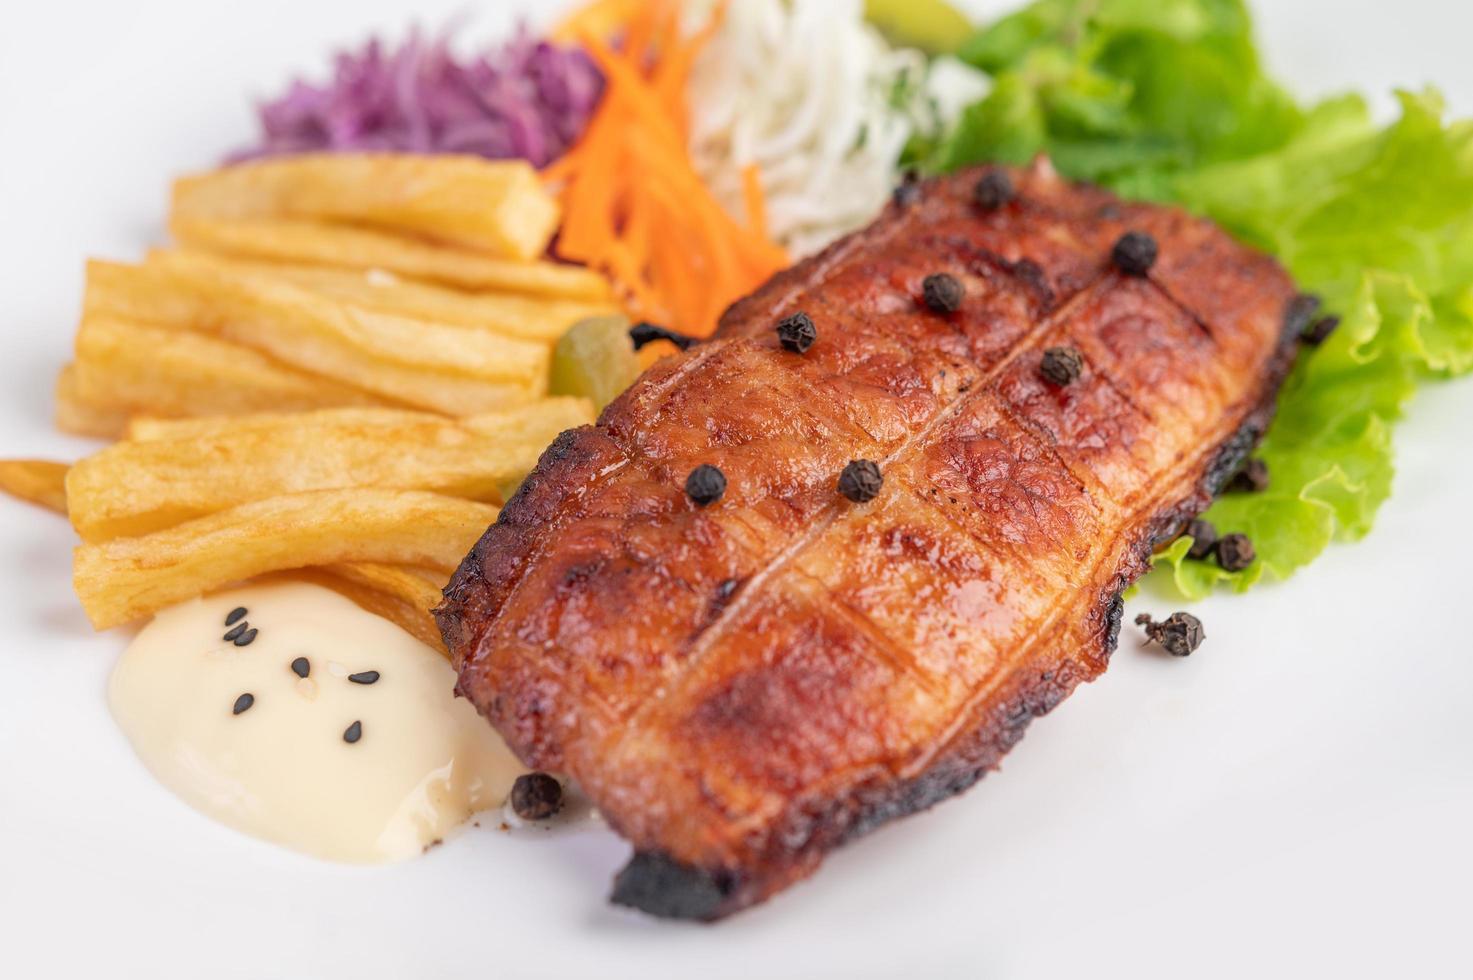 poisson avec frites et salade photo